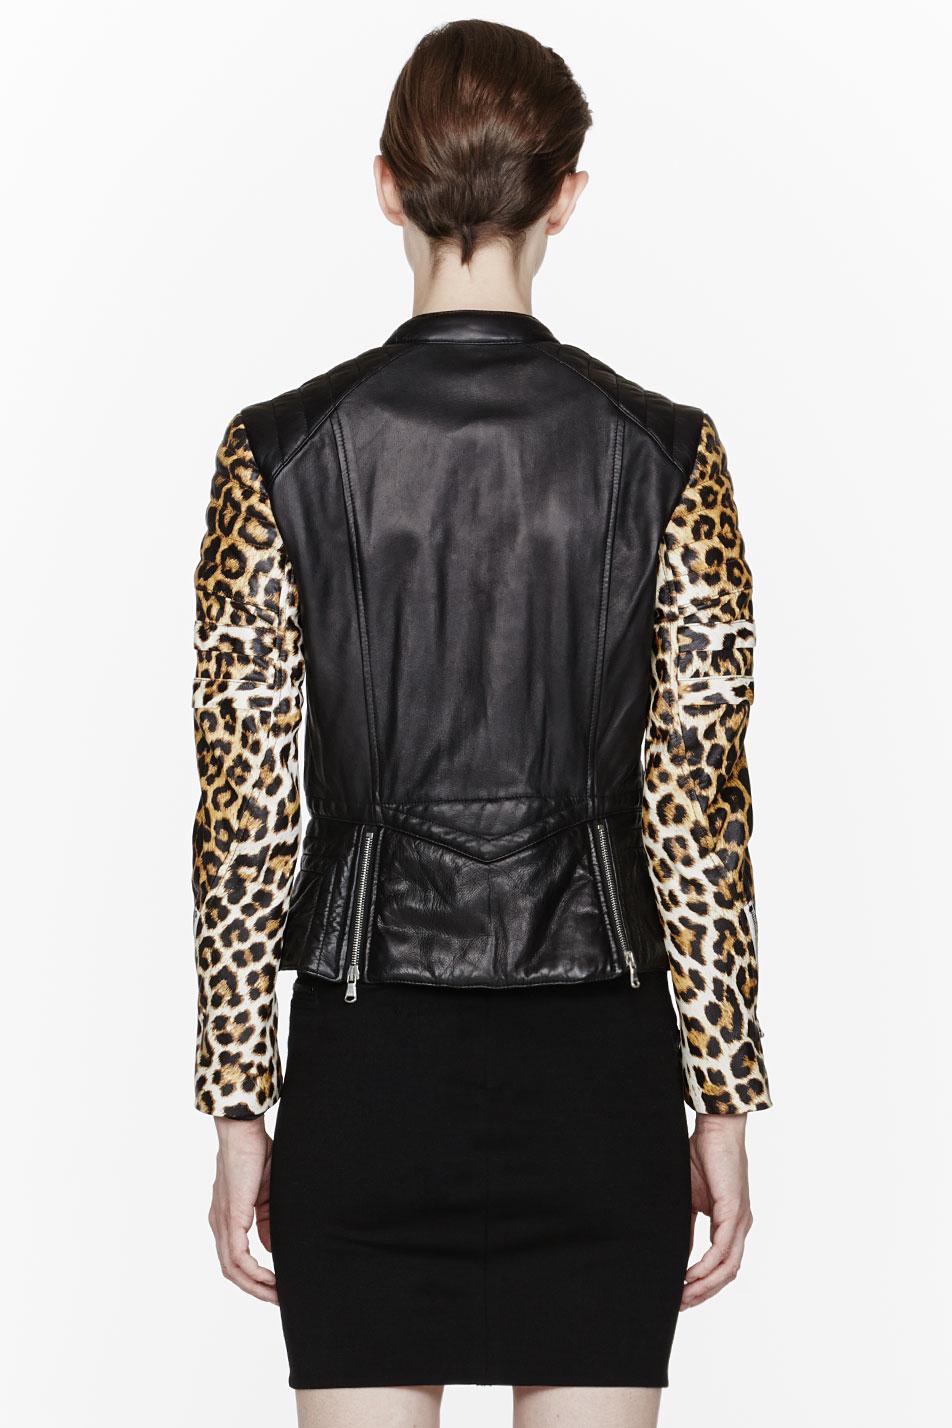 3 1 Phillip Lim Black Leopard Print Peplum Biker Jacket In